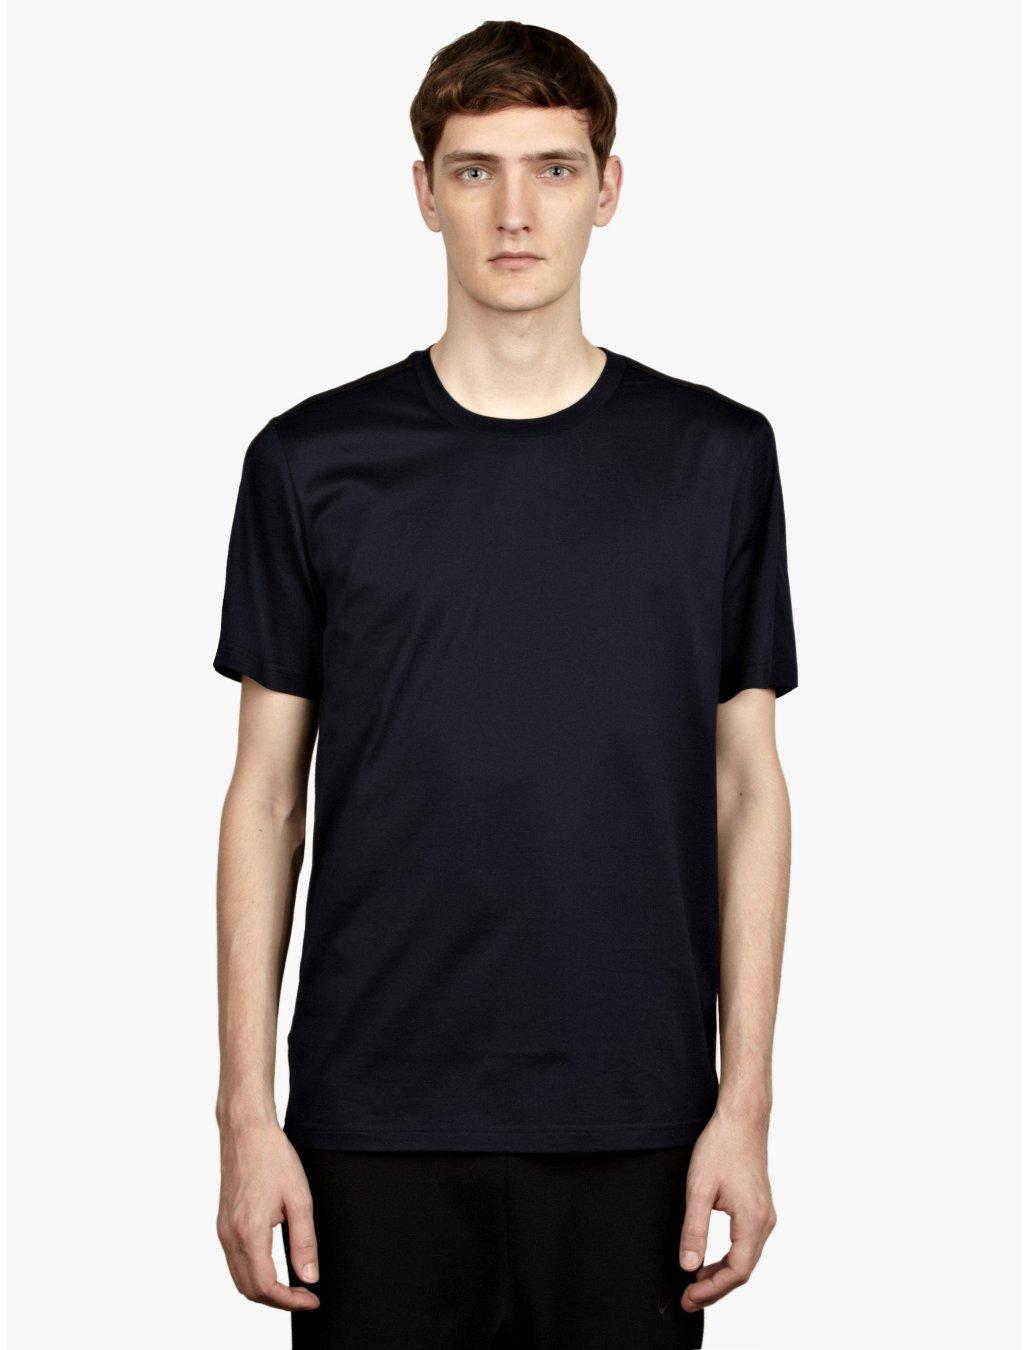 Nike nsw white label mens navy blue taped tshirt in blue for Navy blue and white nike shirt